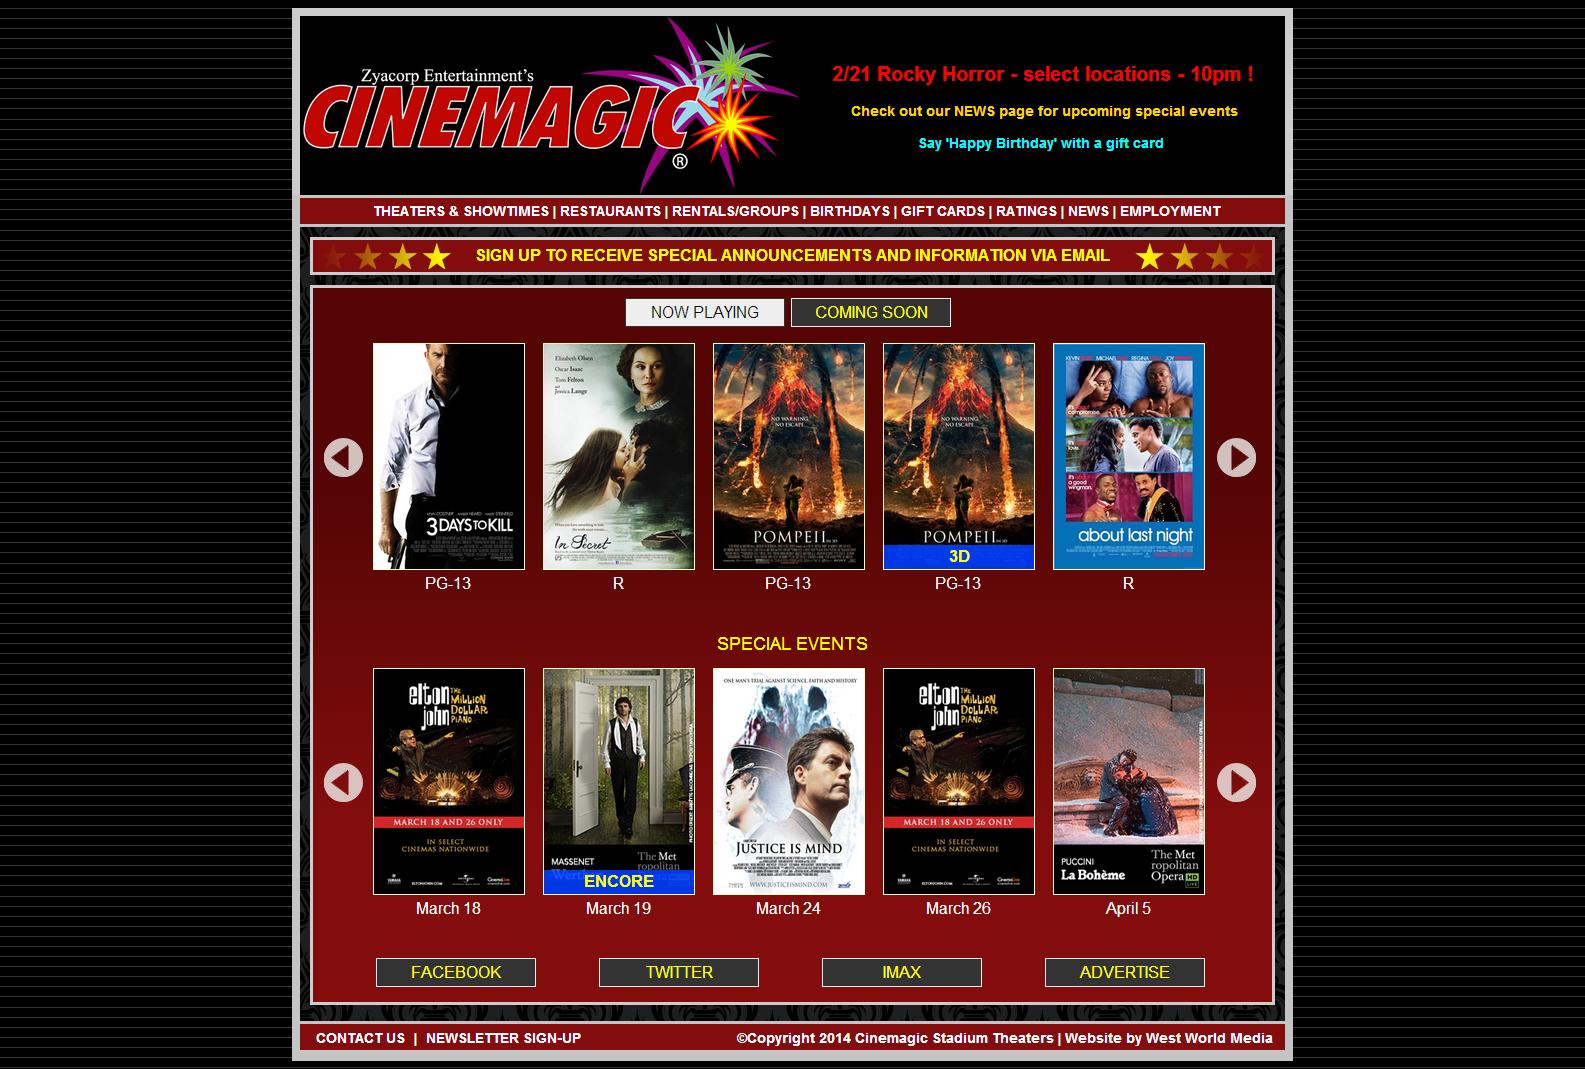 Cinemagic Movies